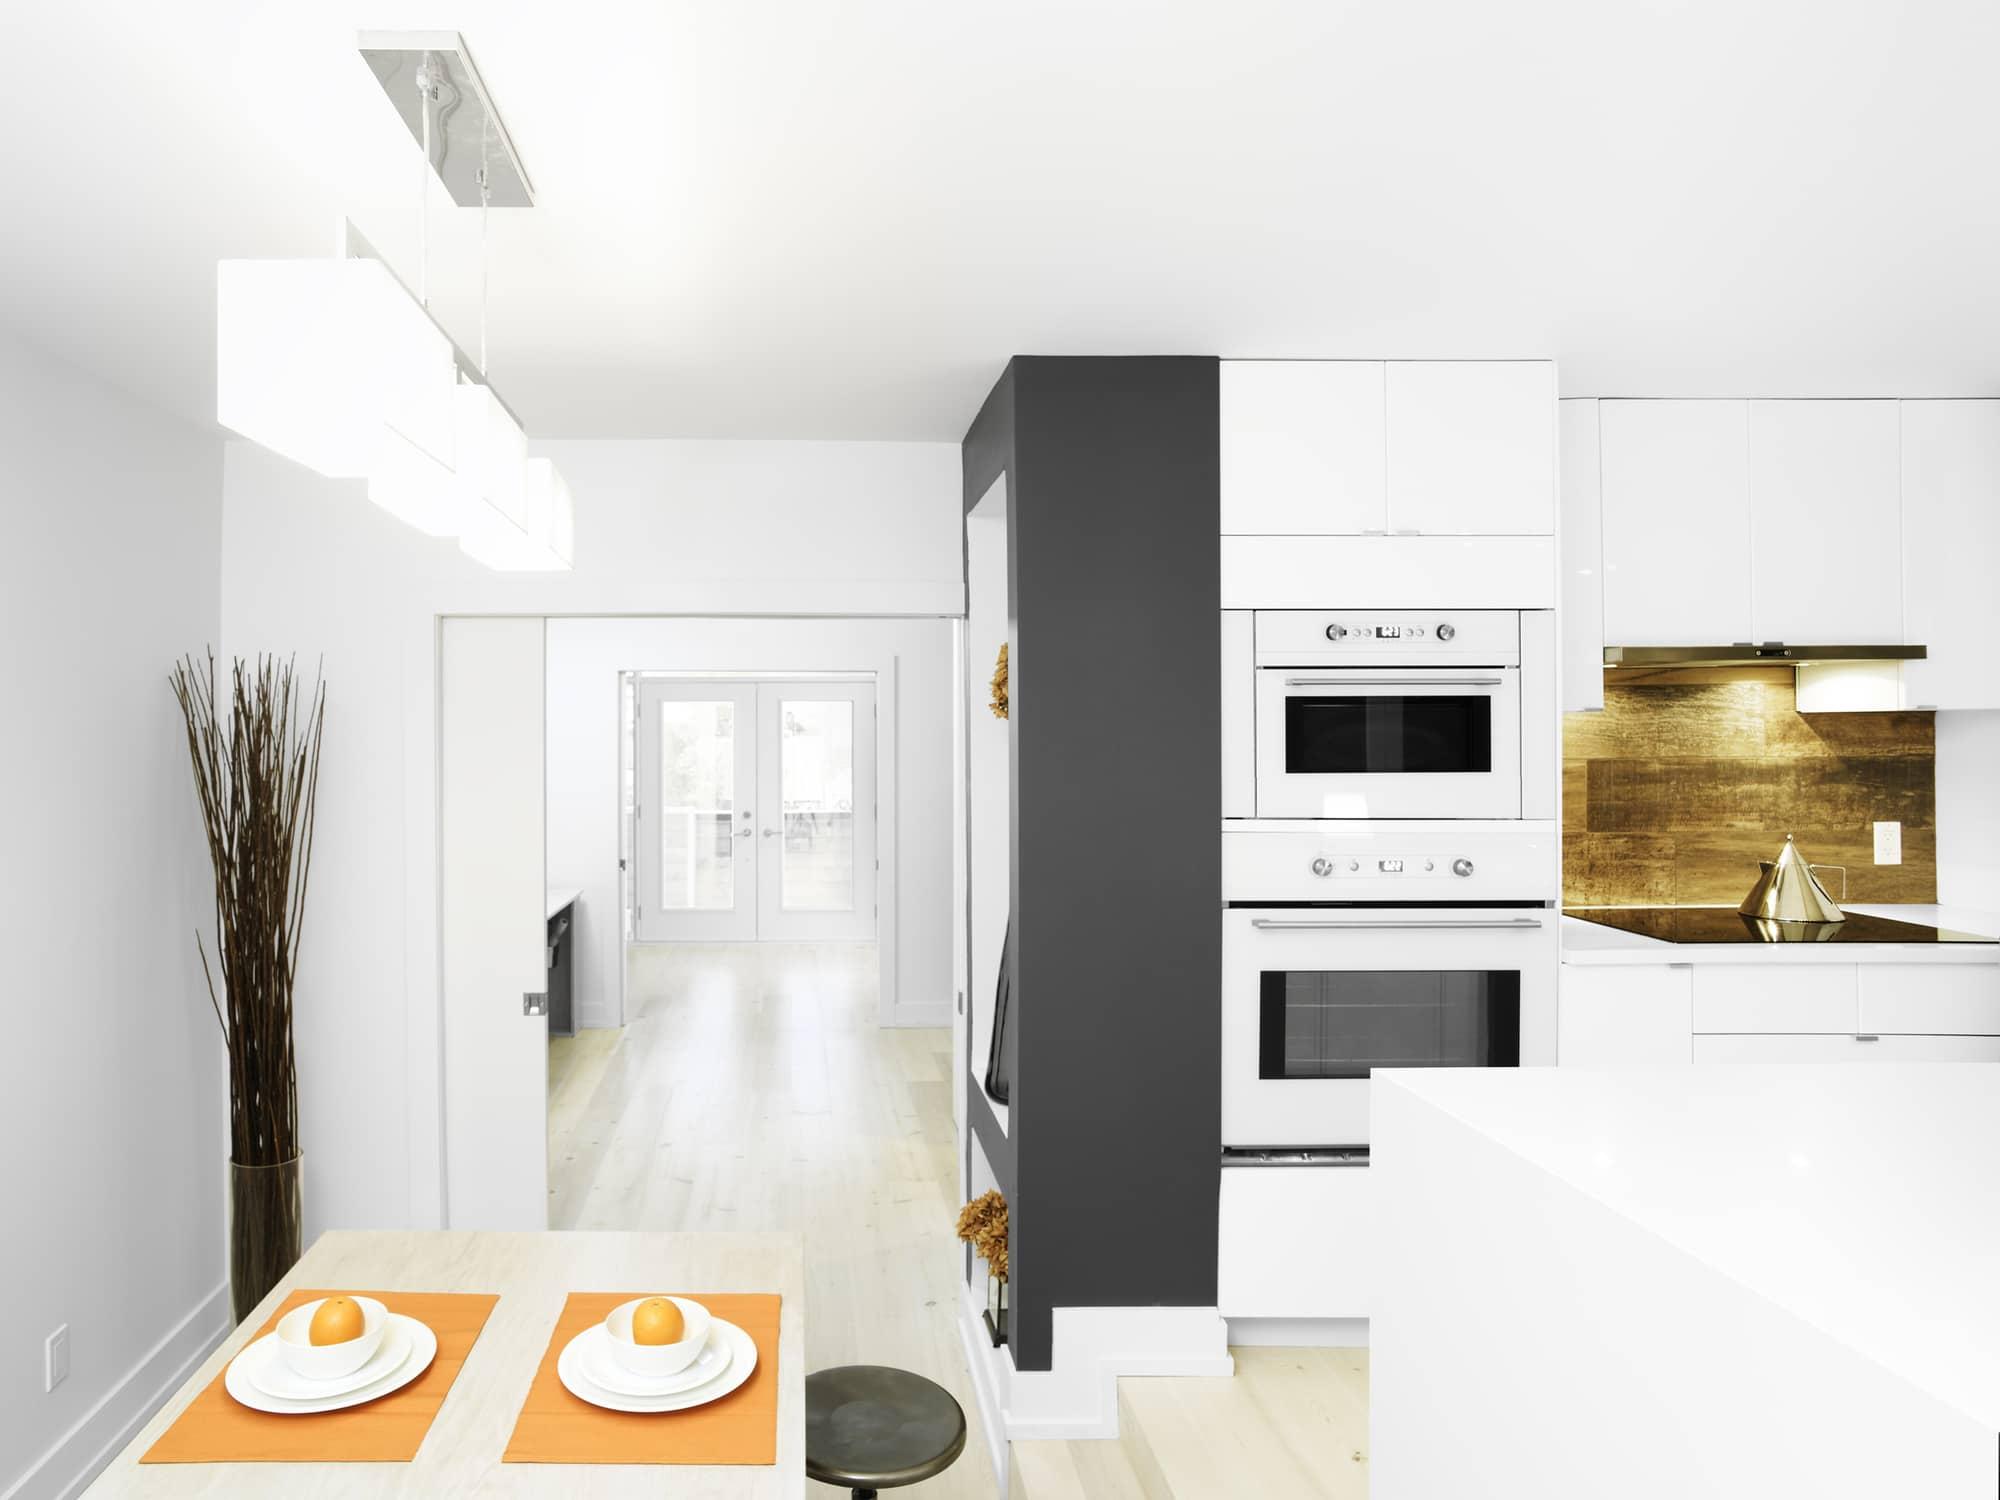 Planos de casa de dos pisos moderna construye hogar - Imagenes de cocinas pequenas para apartamentos ...